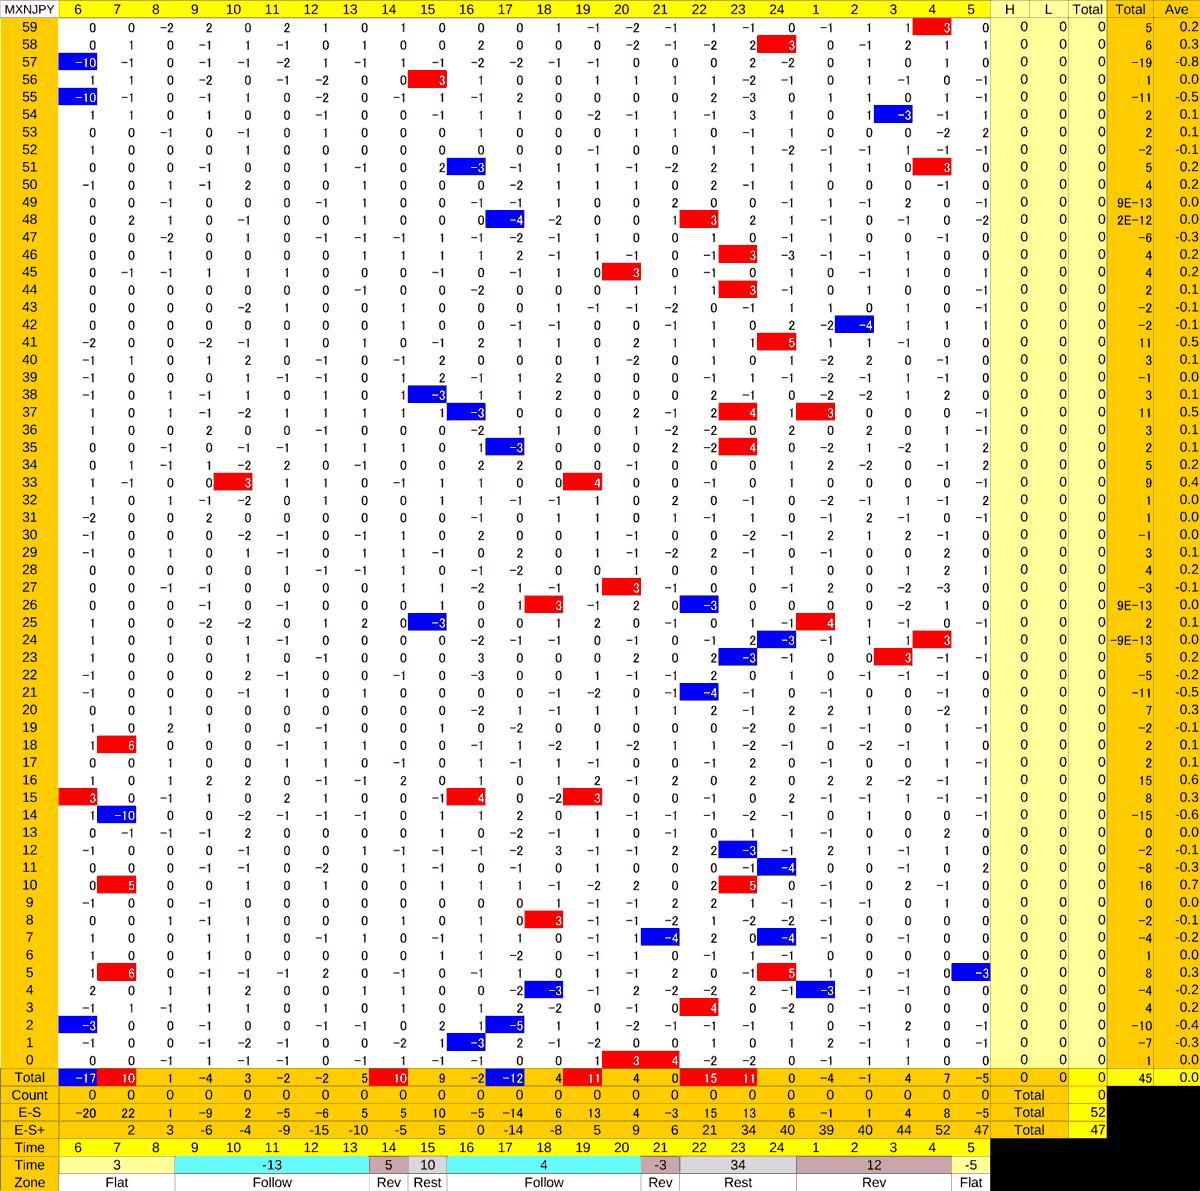 20201119_HS(3)MXNJPY